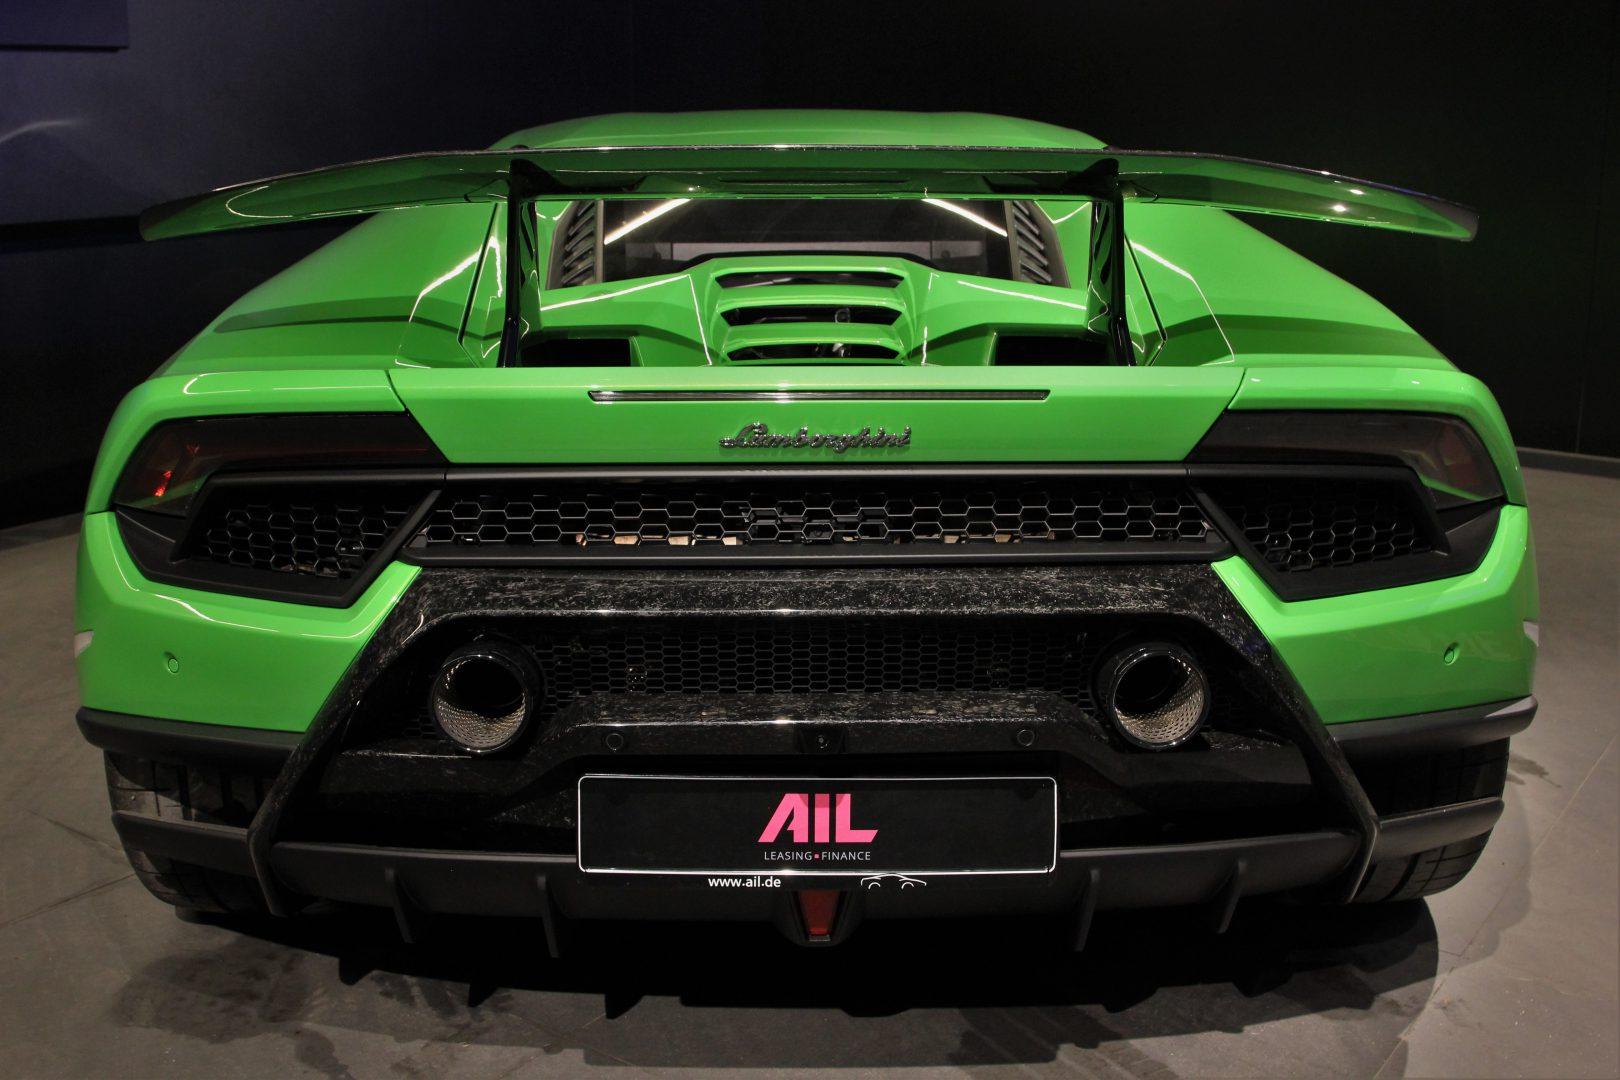 AIL Lamborghini Huracan Performante LP 640-4 Style Paket  6